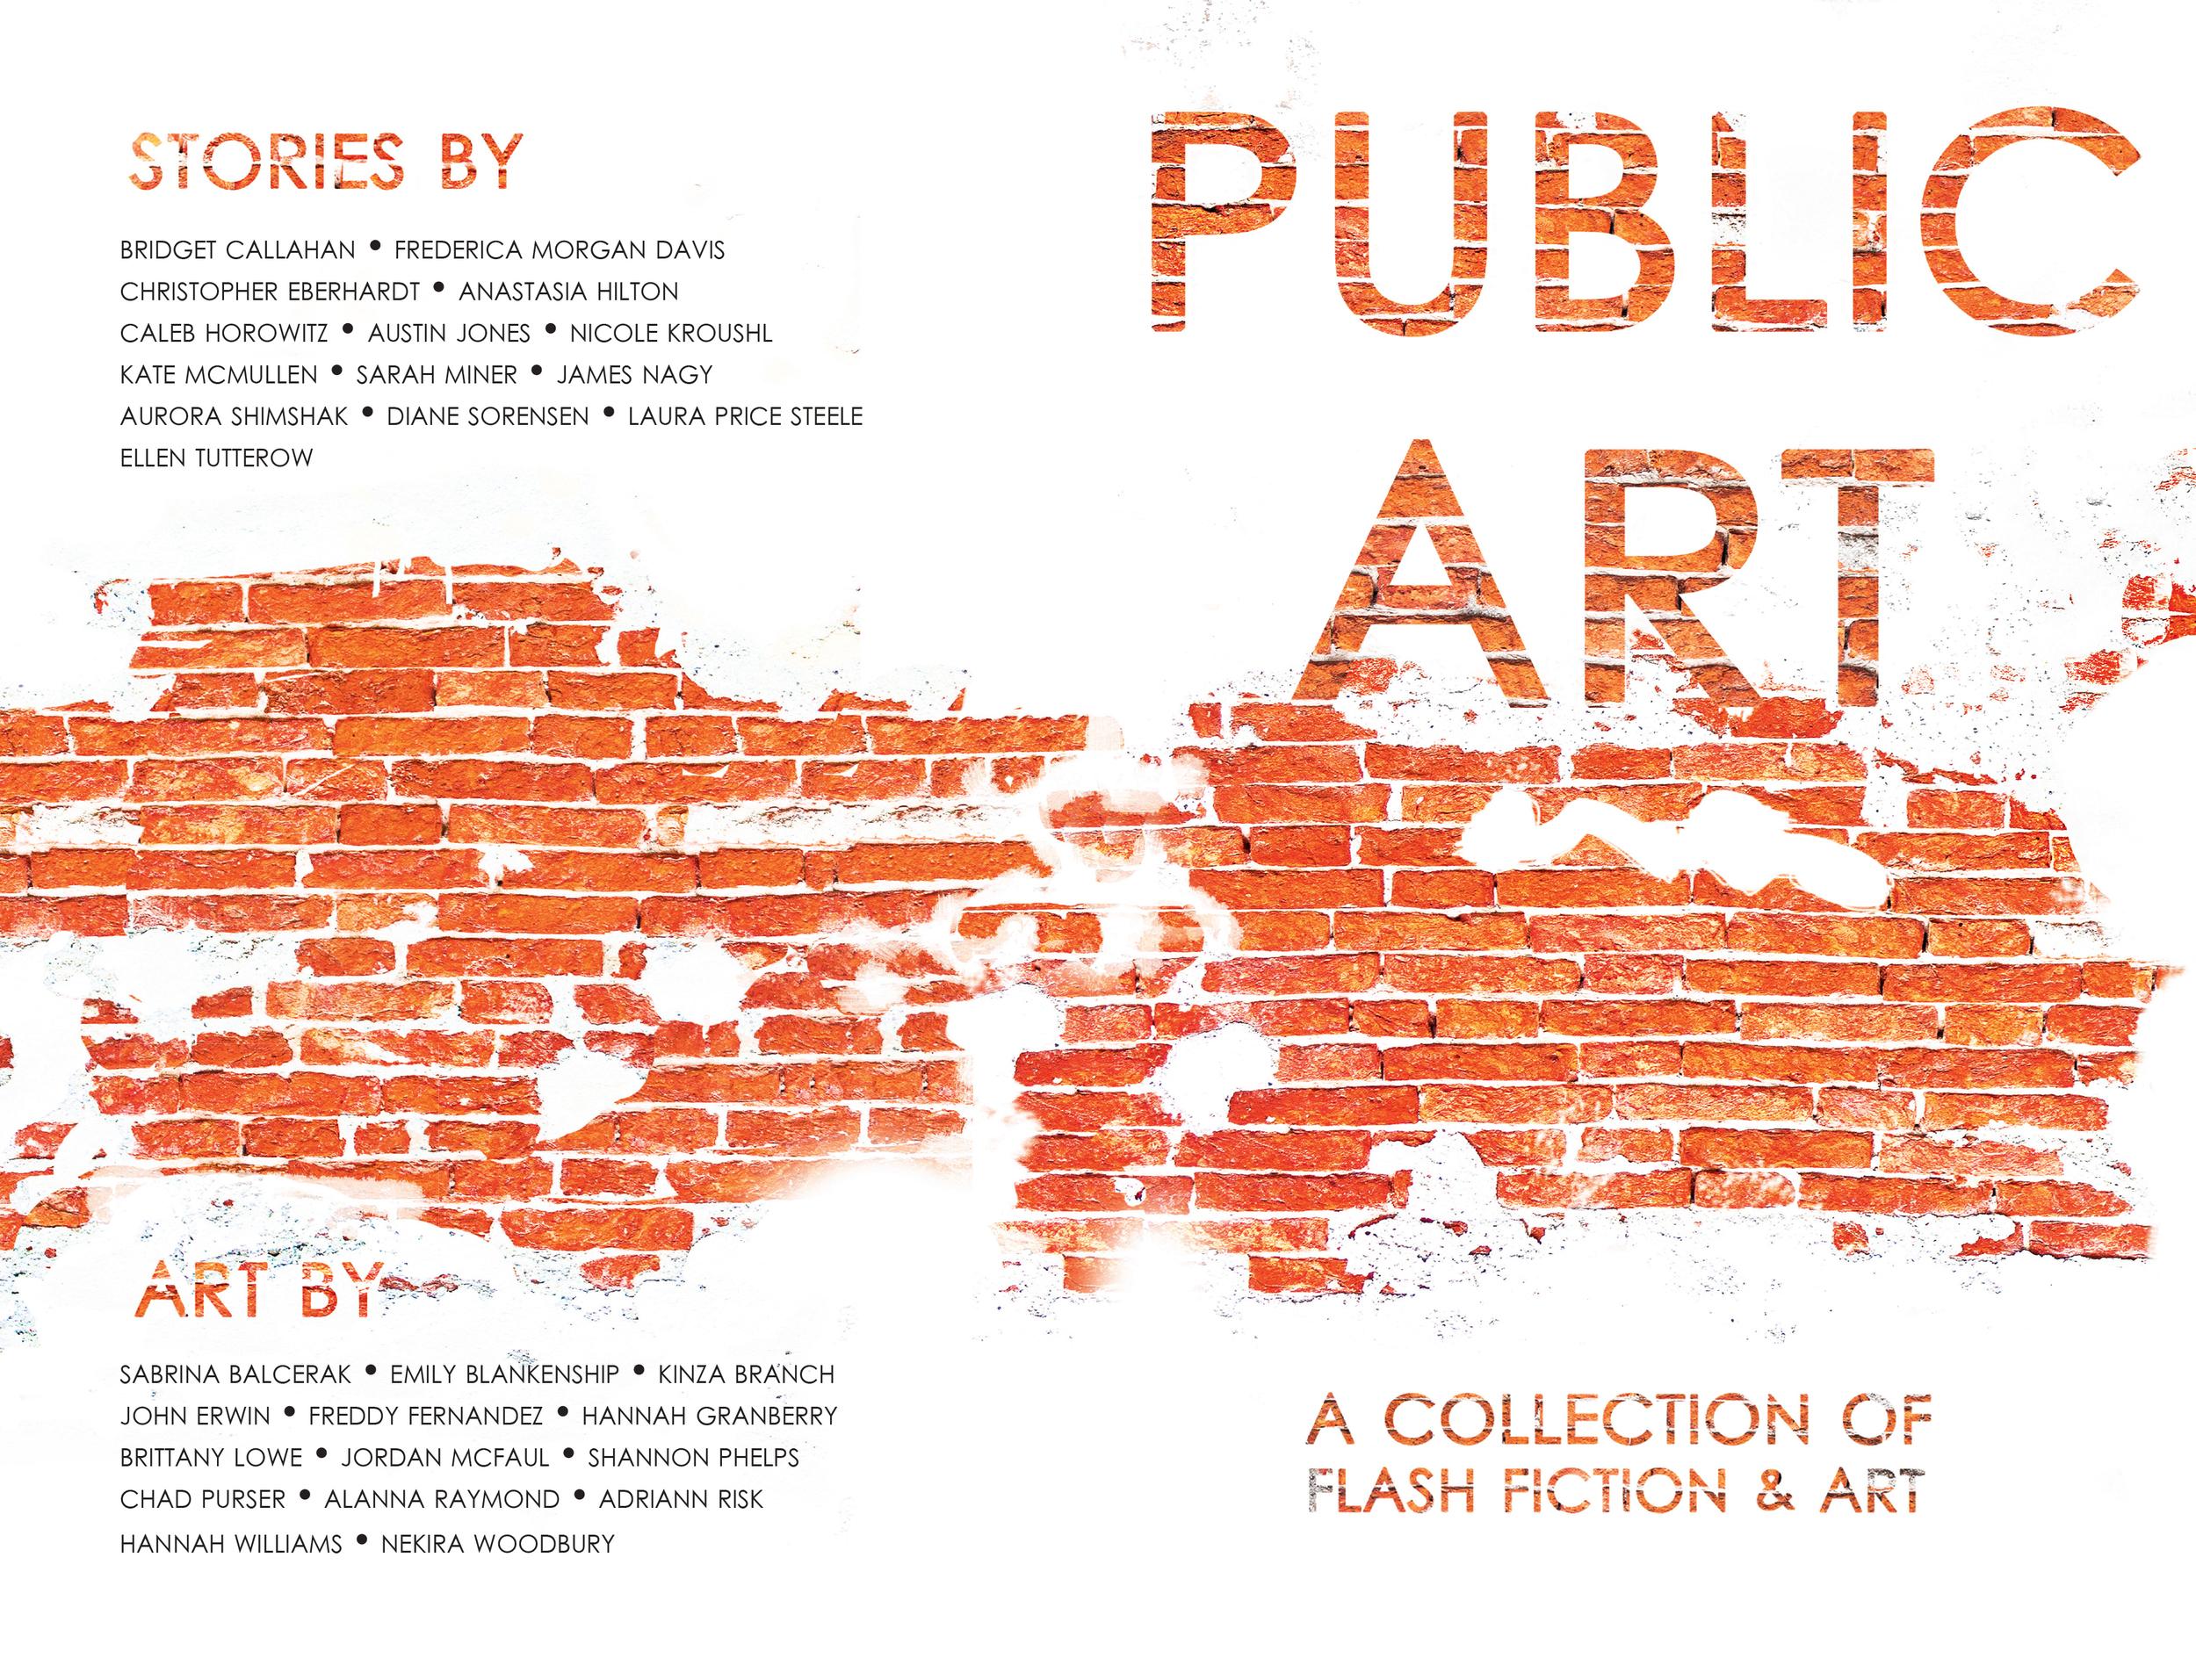 Cover design: Jane Molinary  Publisher: the University of North Carolina Wilmington's Publishing Laboratory  Art Director: John Crawford